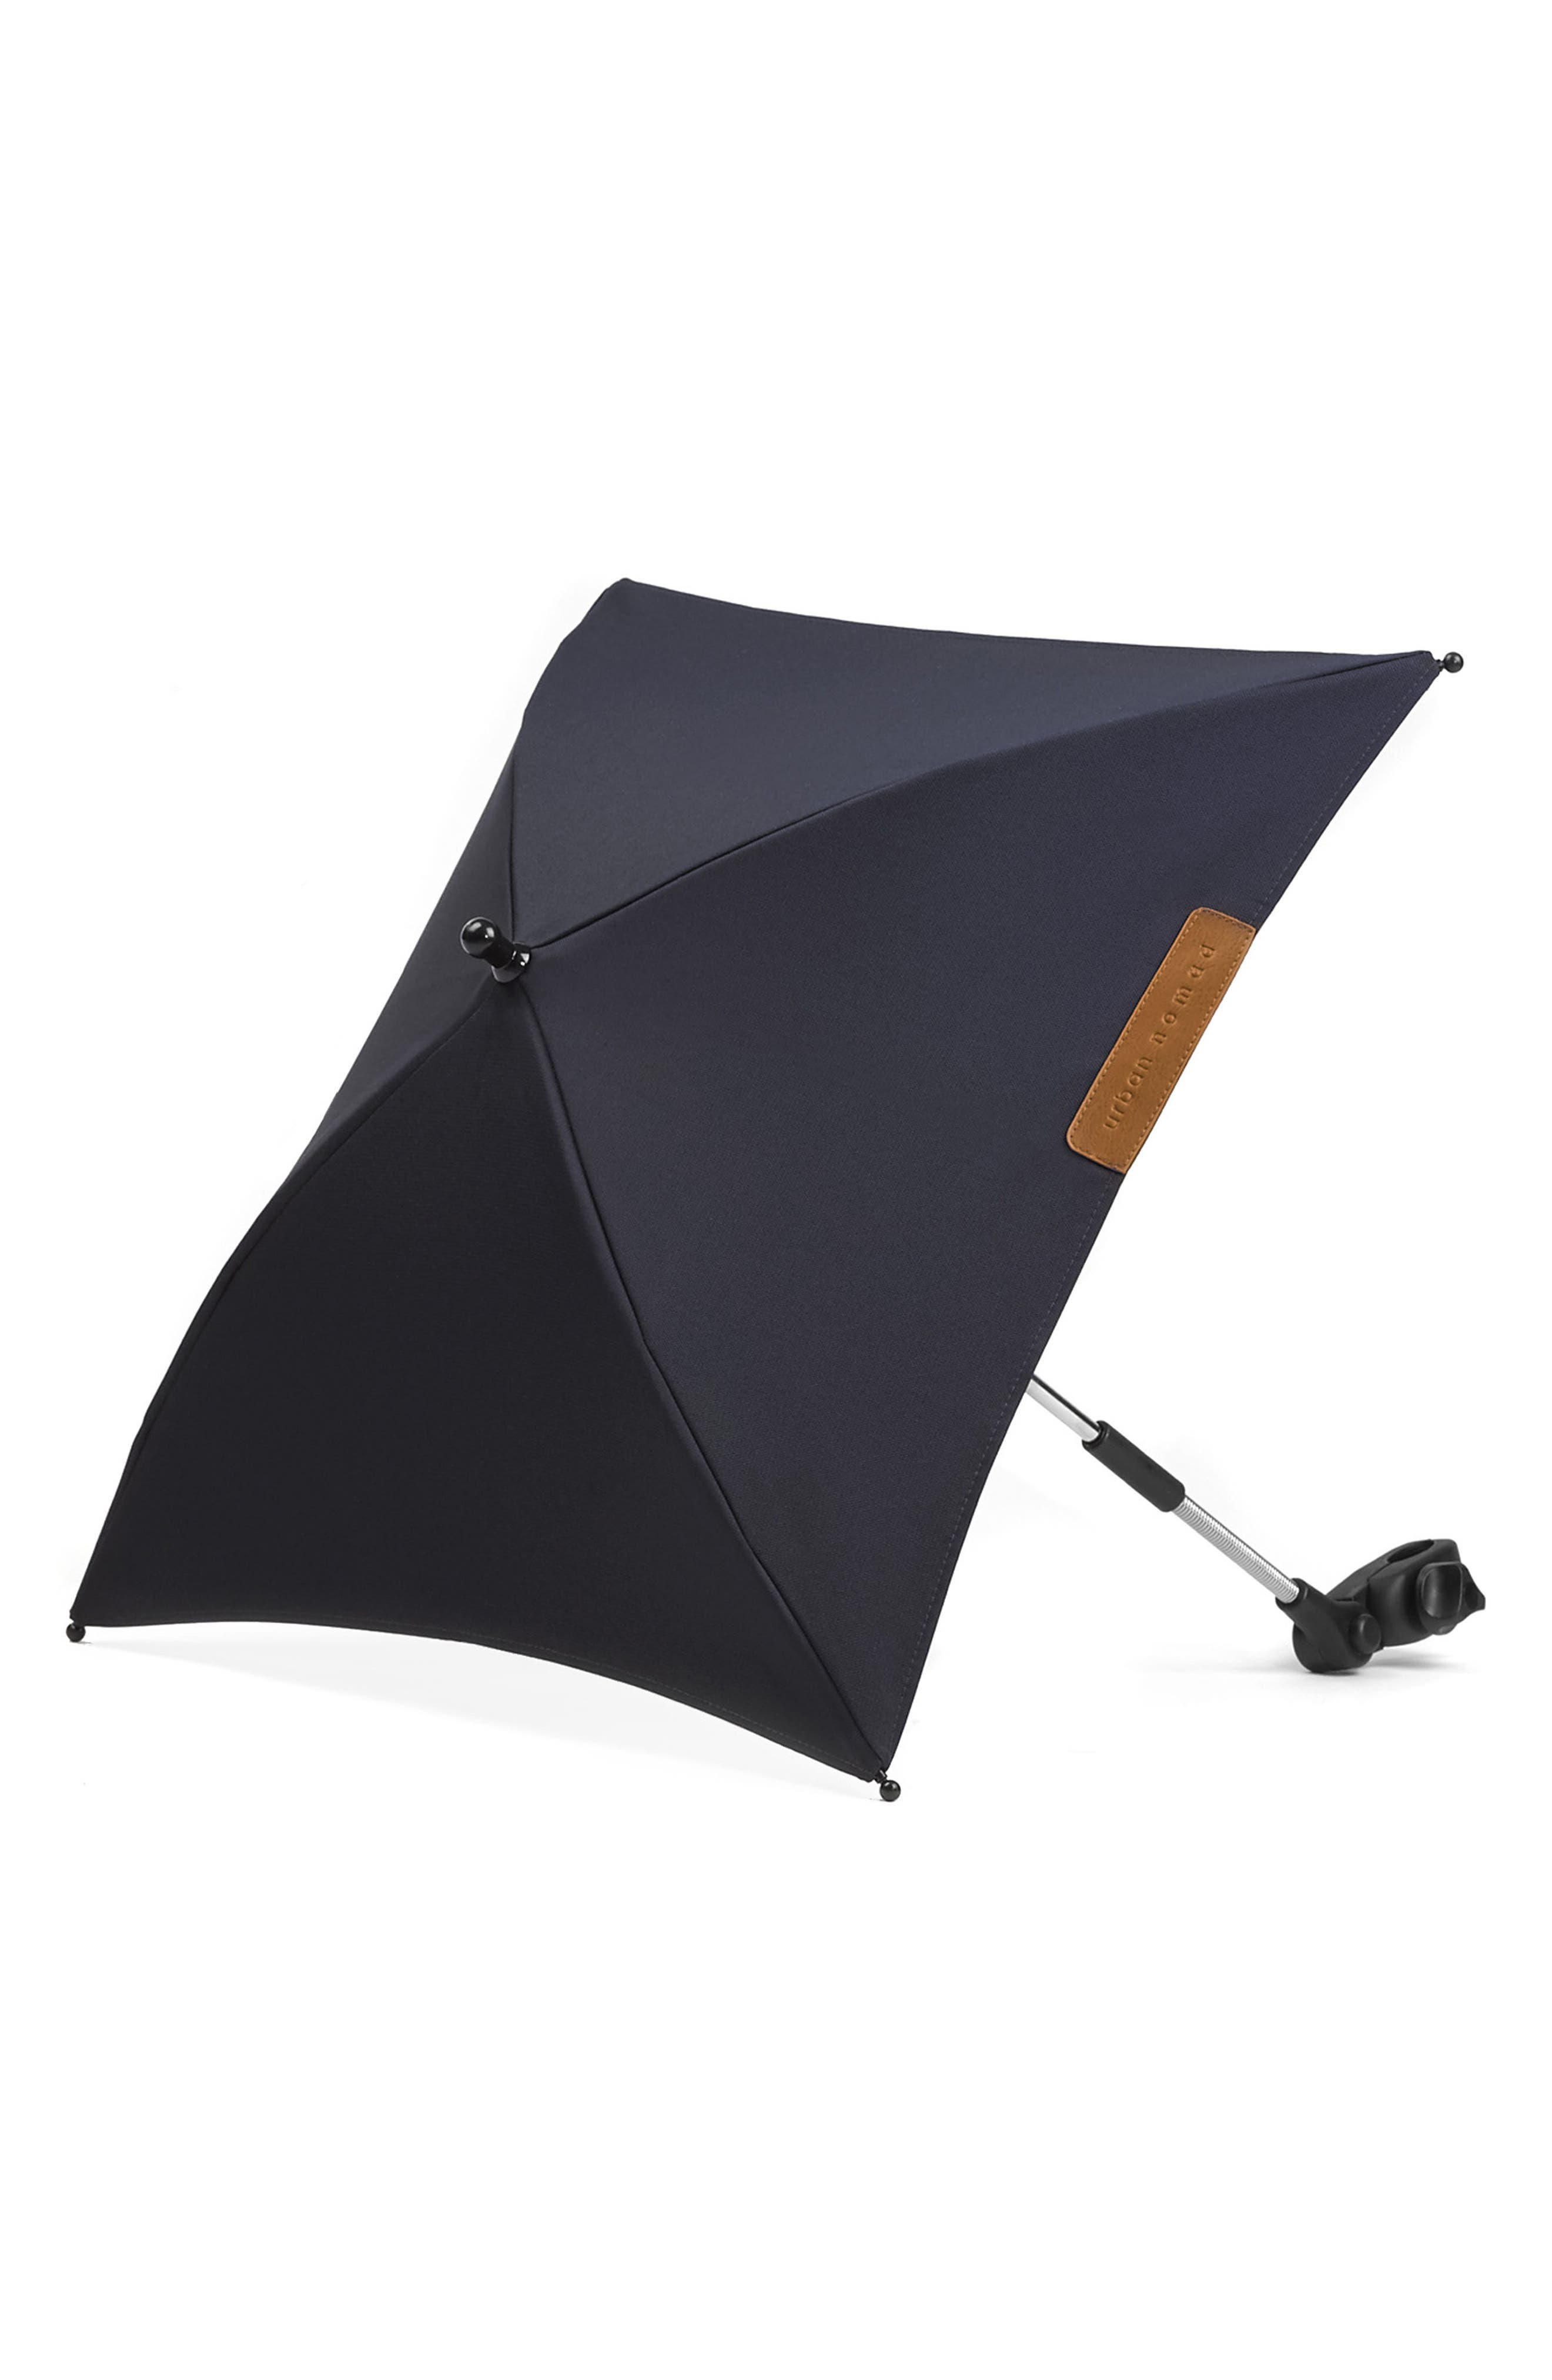 Evo - Urban Nomad Stroller Umbrella,                             Main thumbnail 1, color,                             400